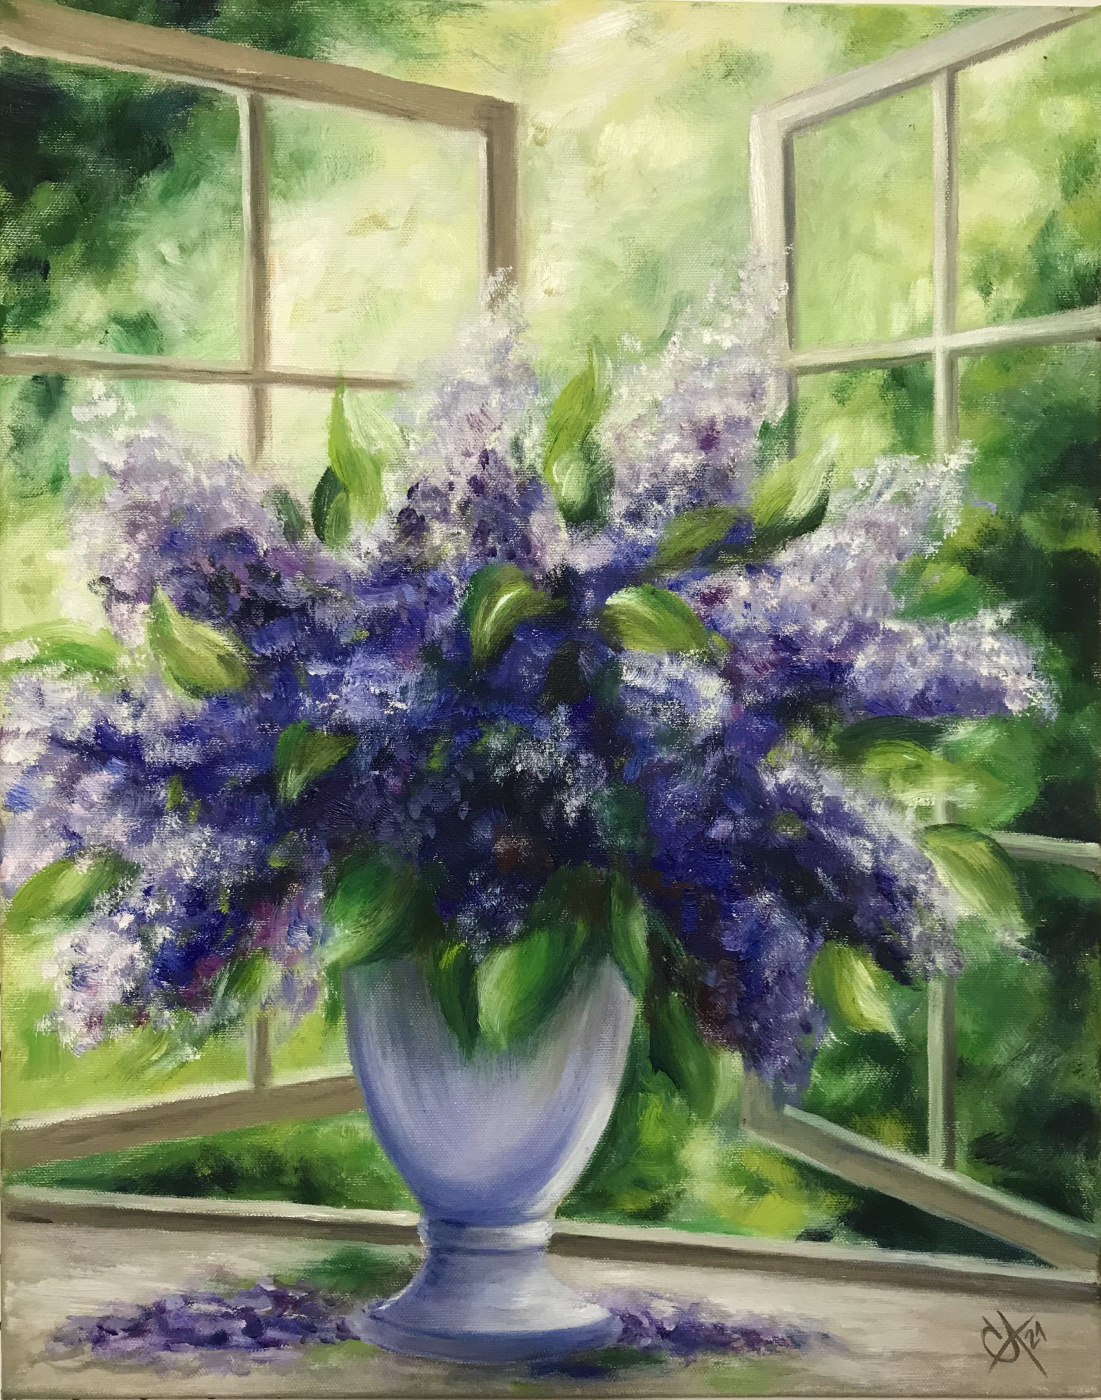 Svetlana Arkhipova. A bouquet of lilacs by an open window